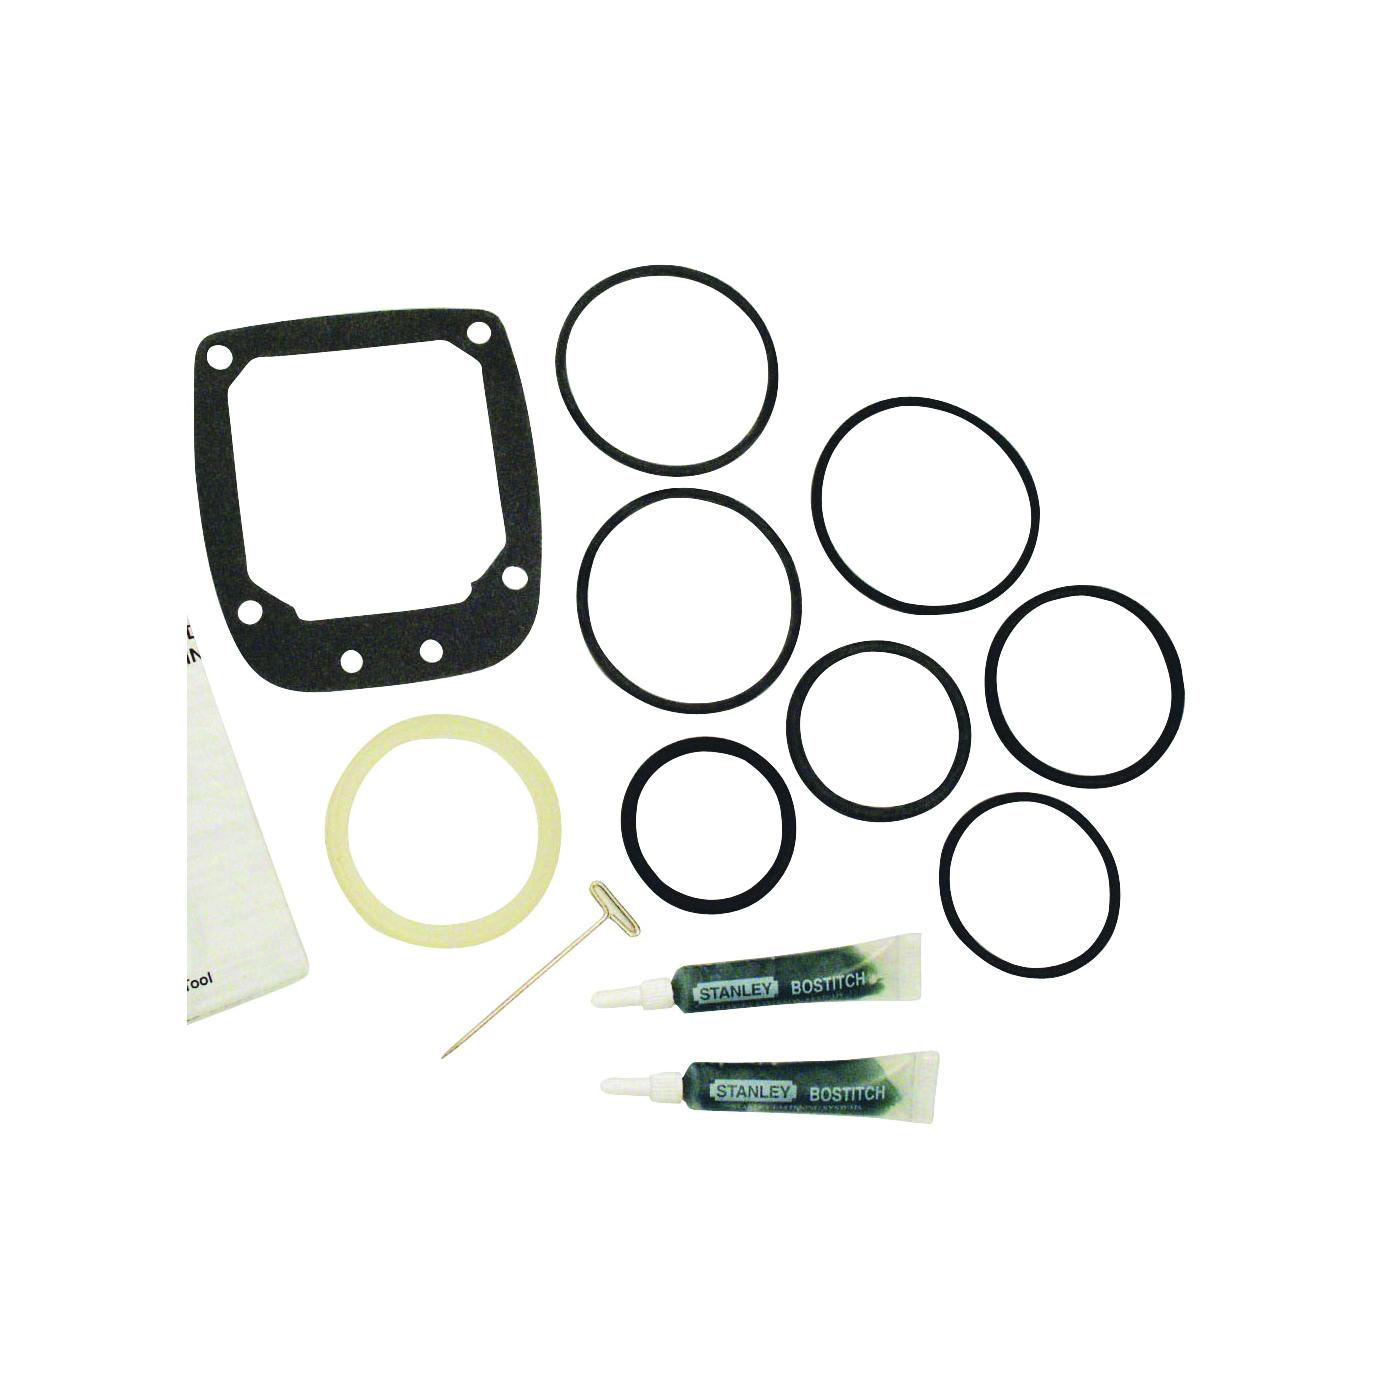 Picture of Bostitch ORK11 O-Ring Kit, For: N79, N80, N90, N95 Nailer